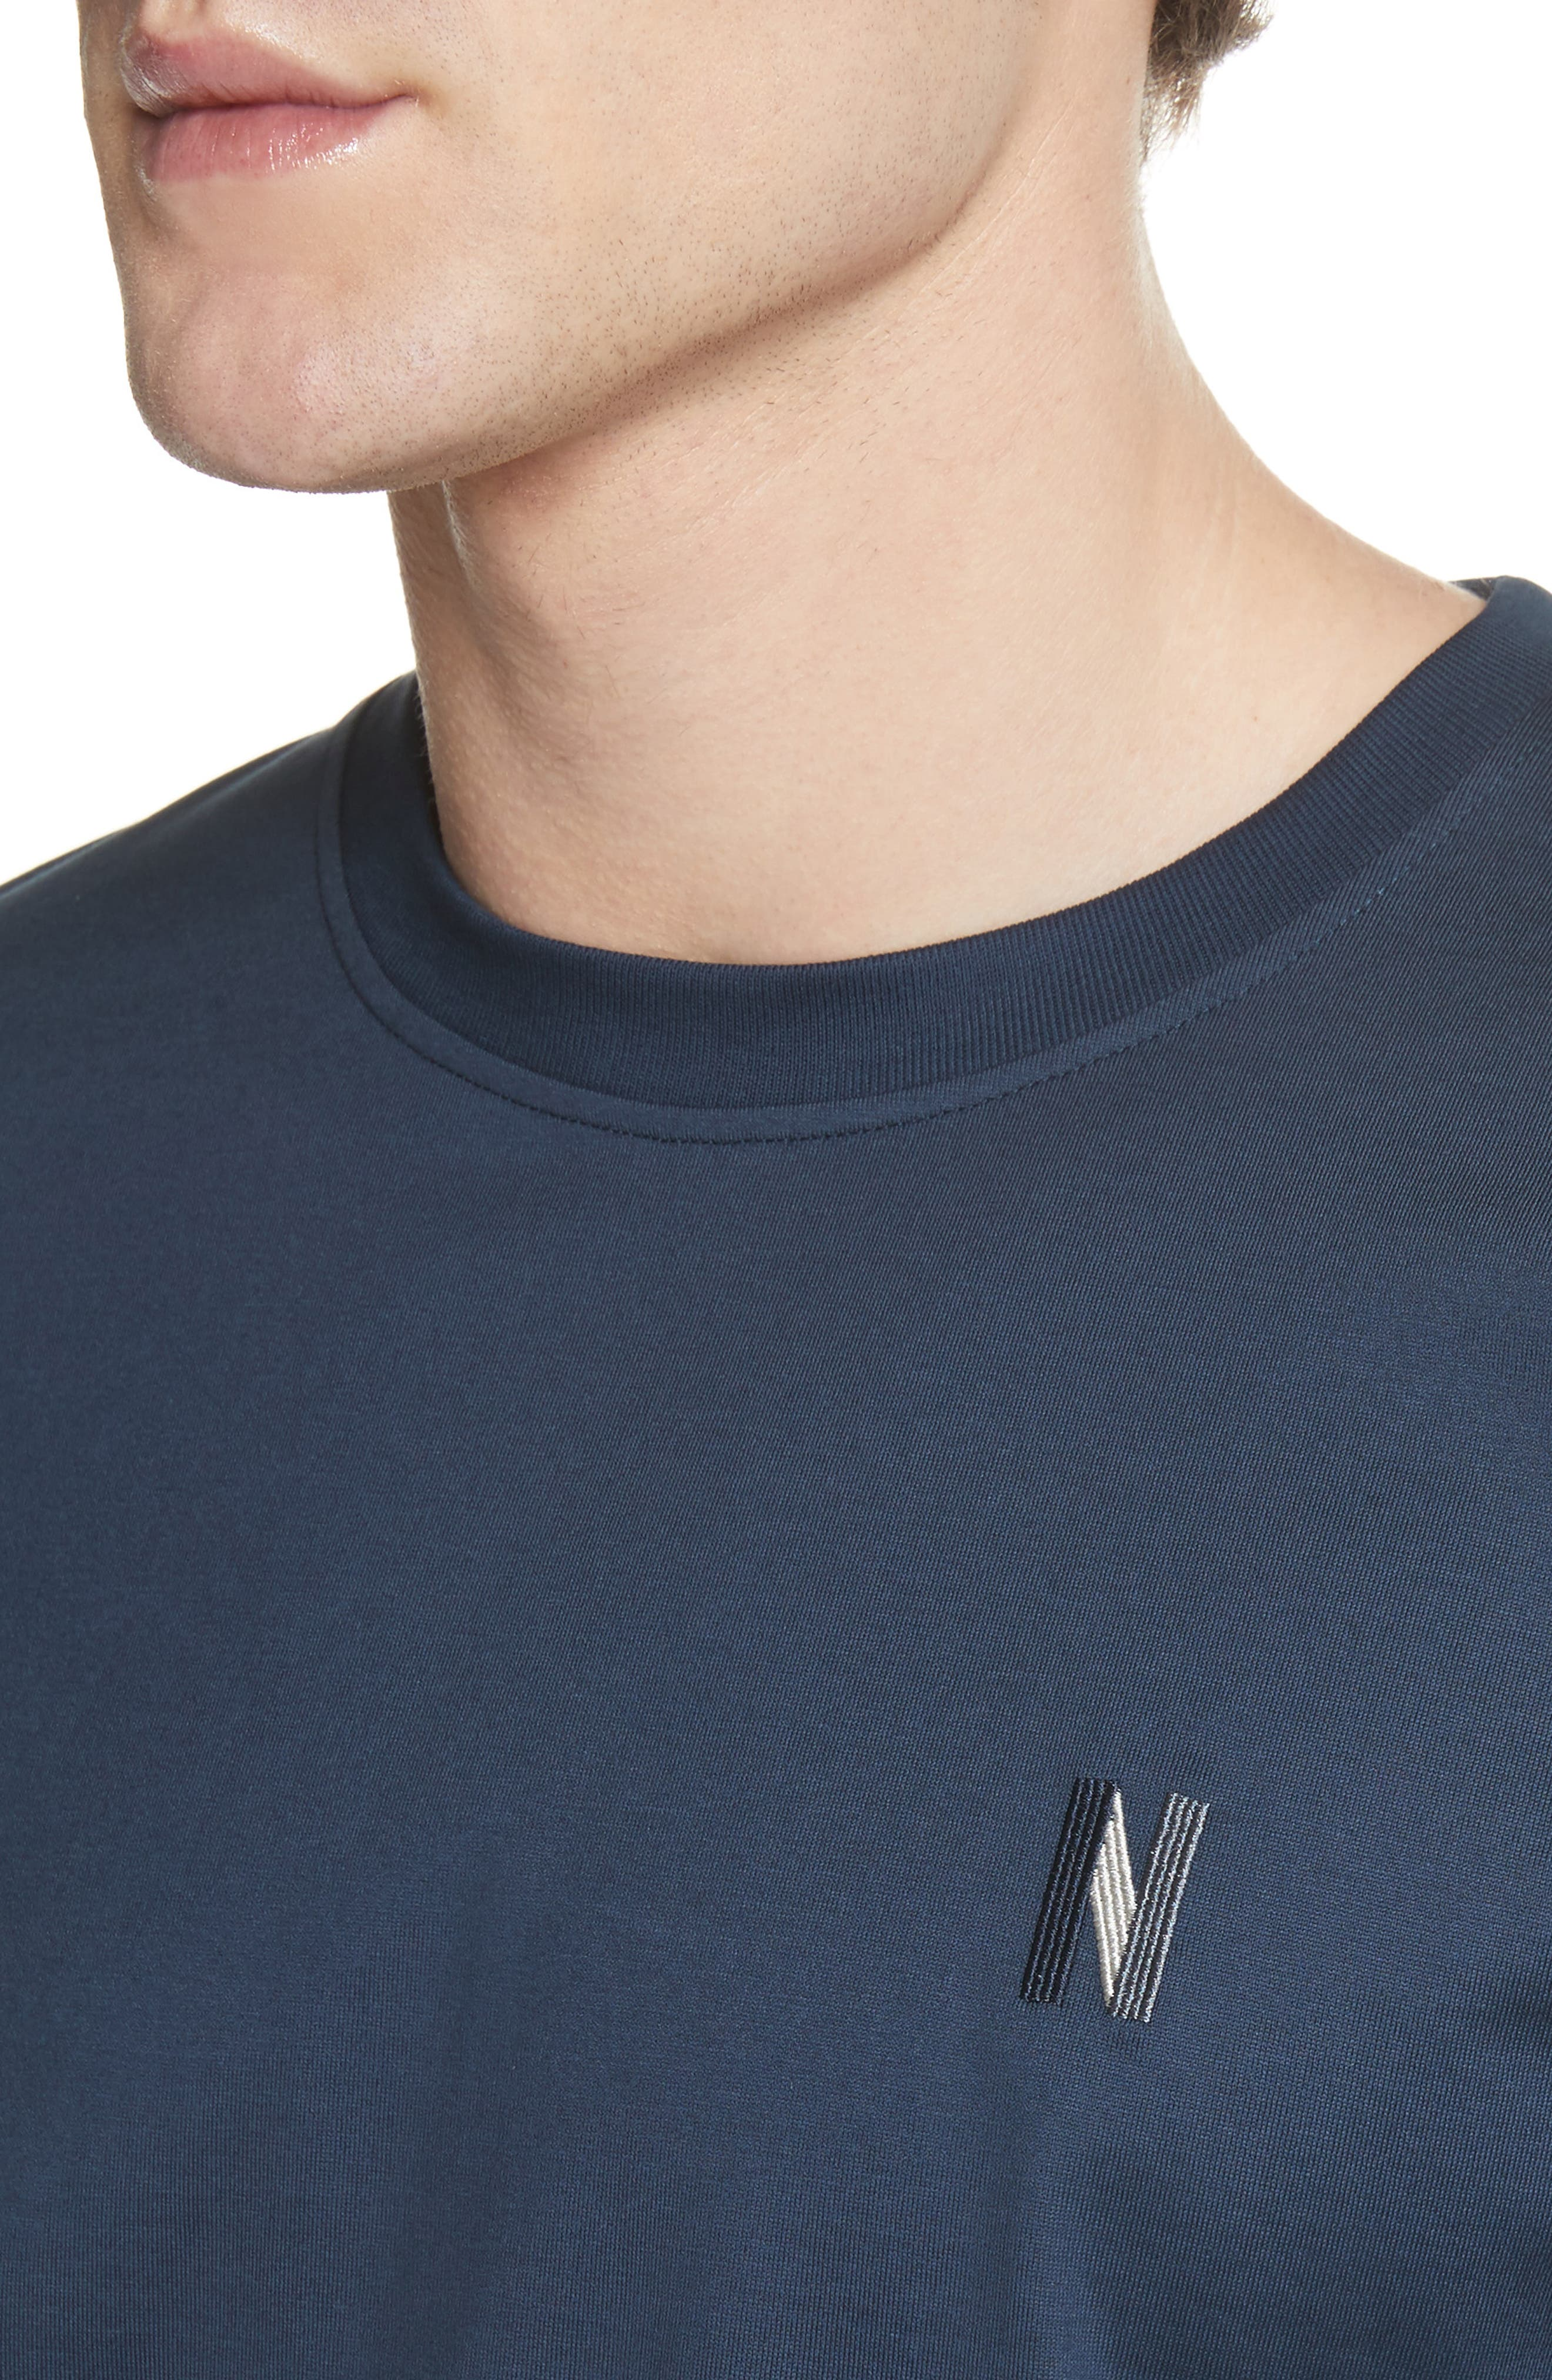 Niels N-Logo T-Shirt,                             Alternate thumbnail 4, color,                             410